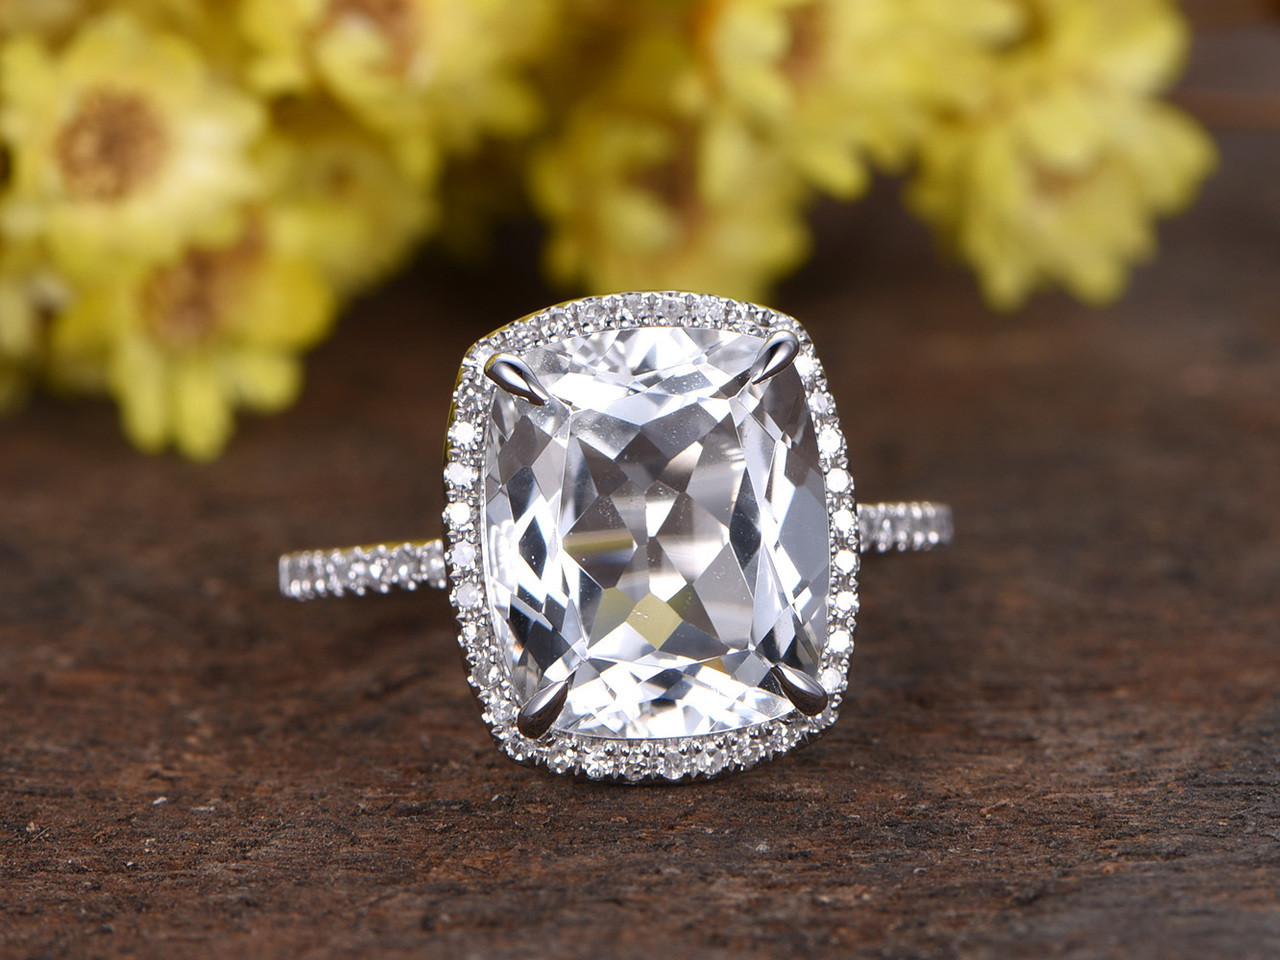 5 Carat White Topaz Engagement Ring With Diamond White